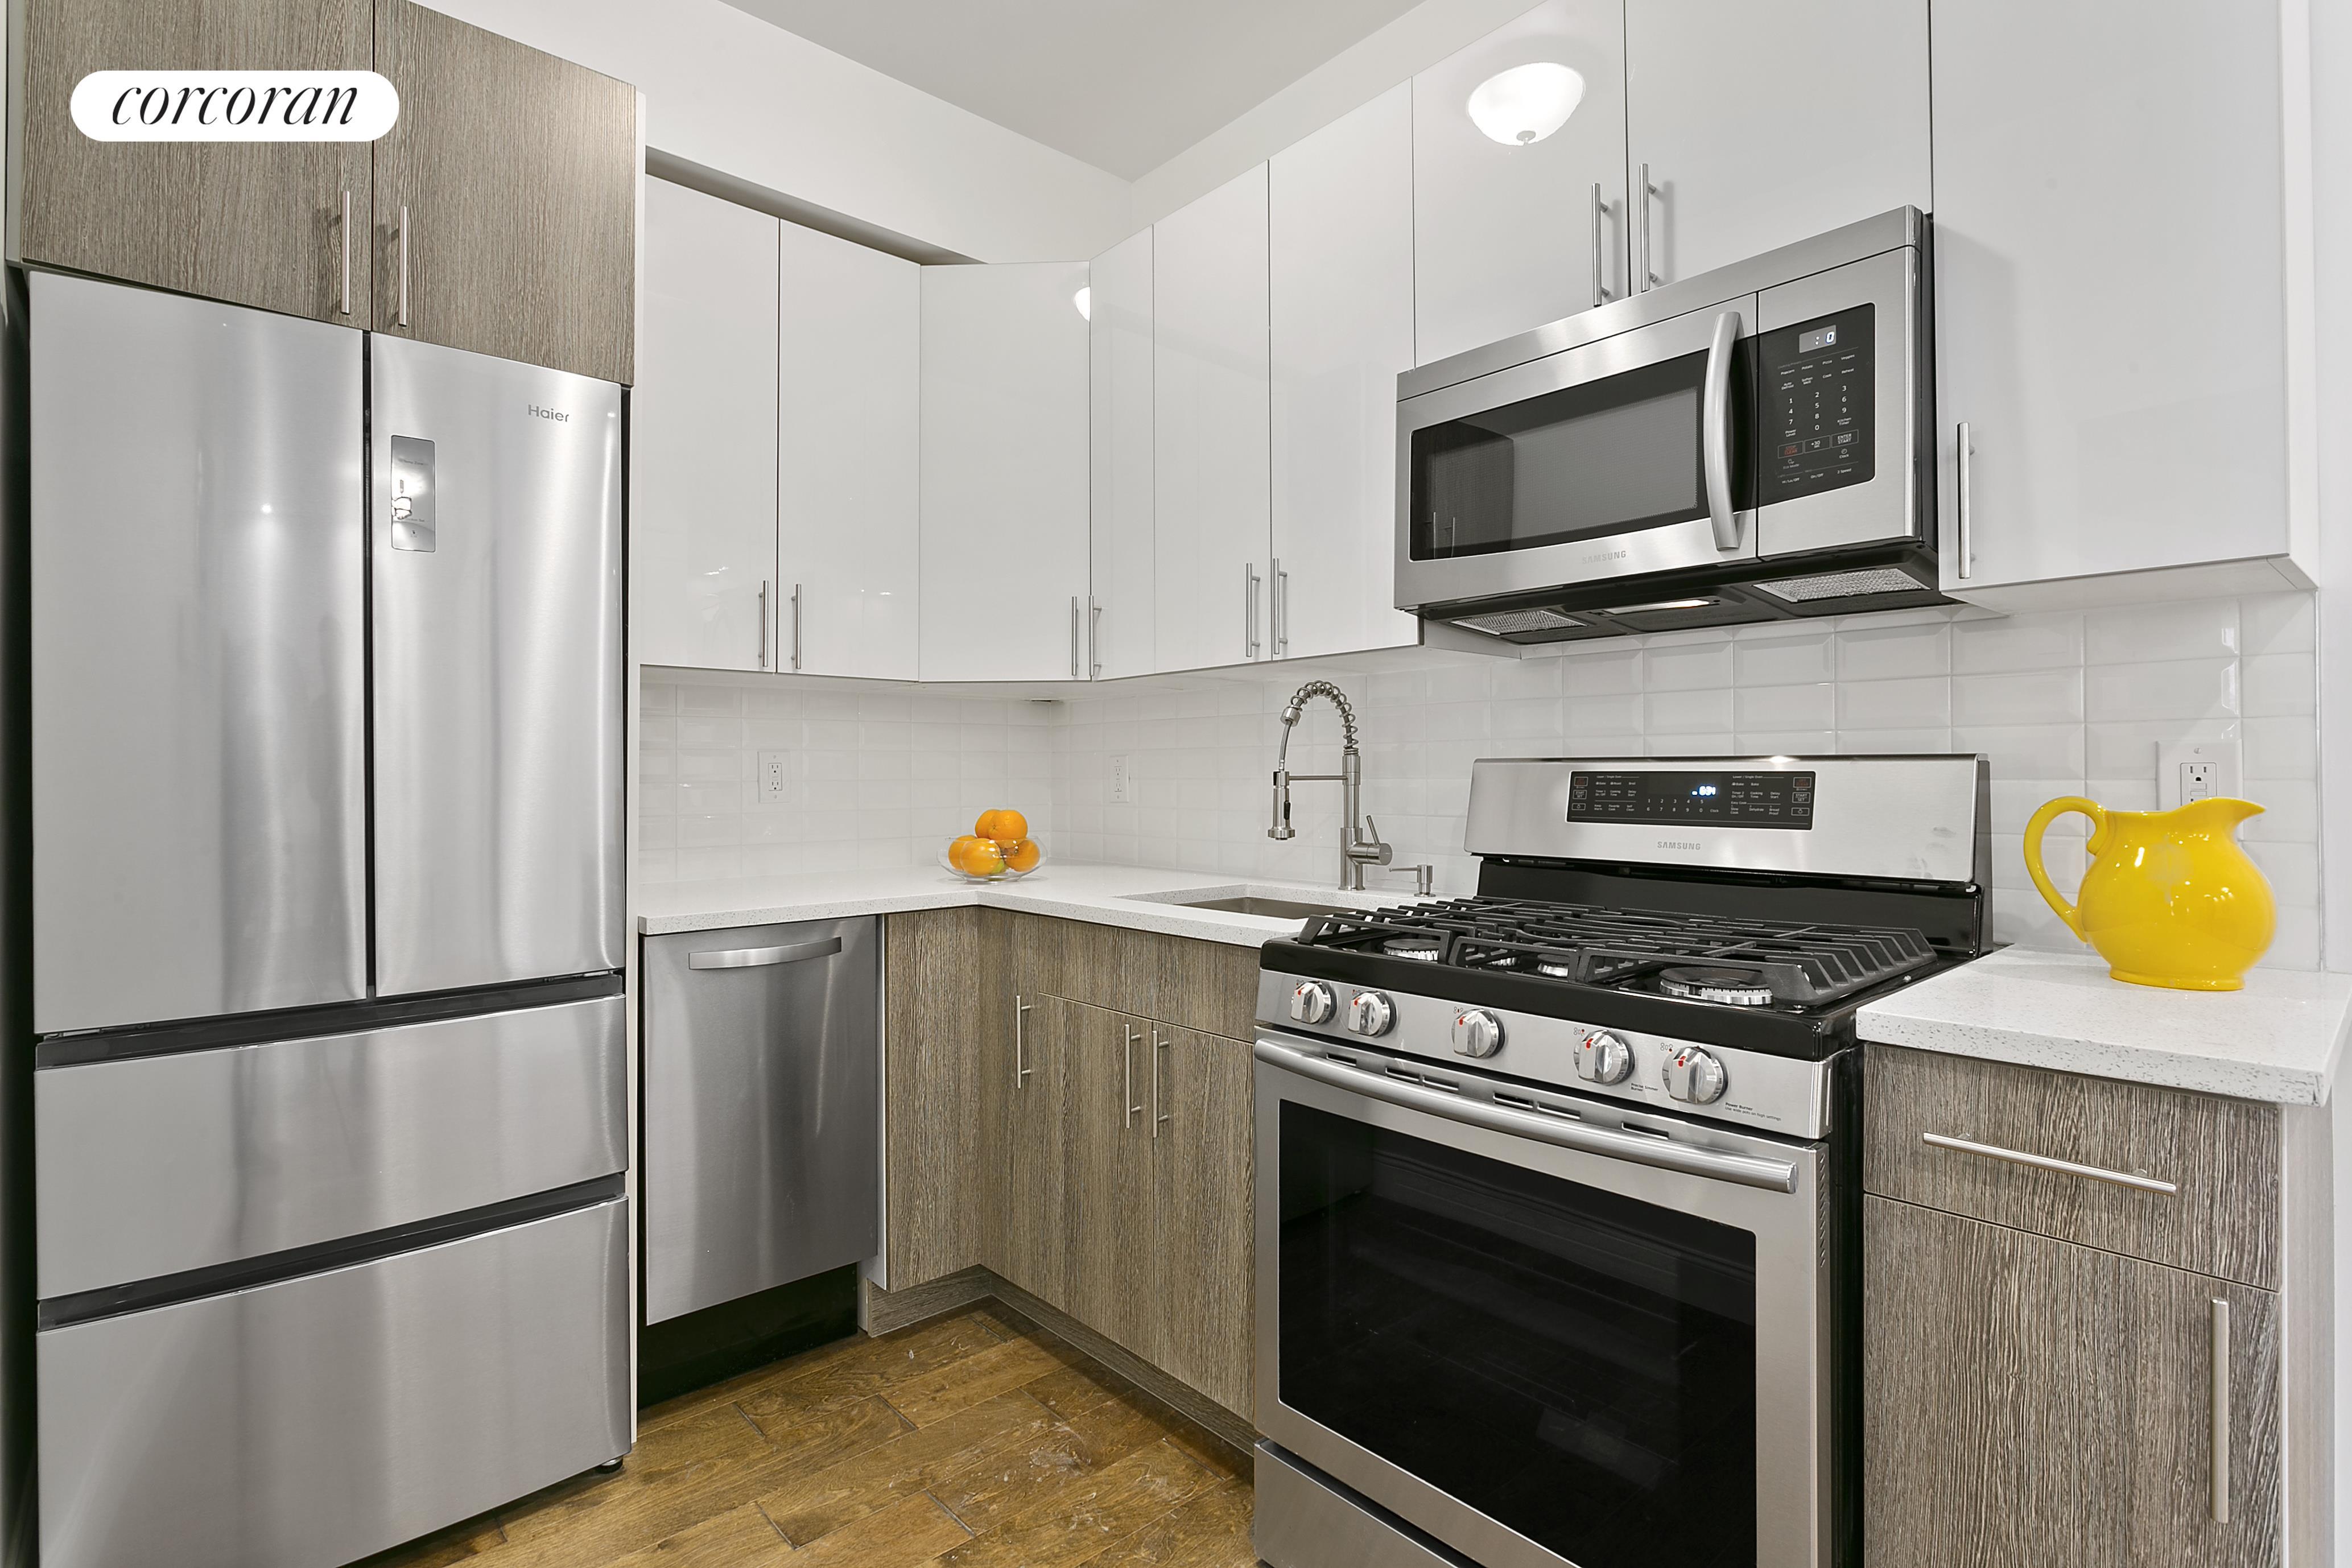 Corcoran, 151 Somers Street, Apt. 4A, Bedford-Stuyvesant Real Estate ...